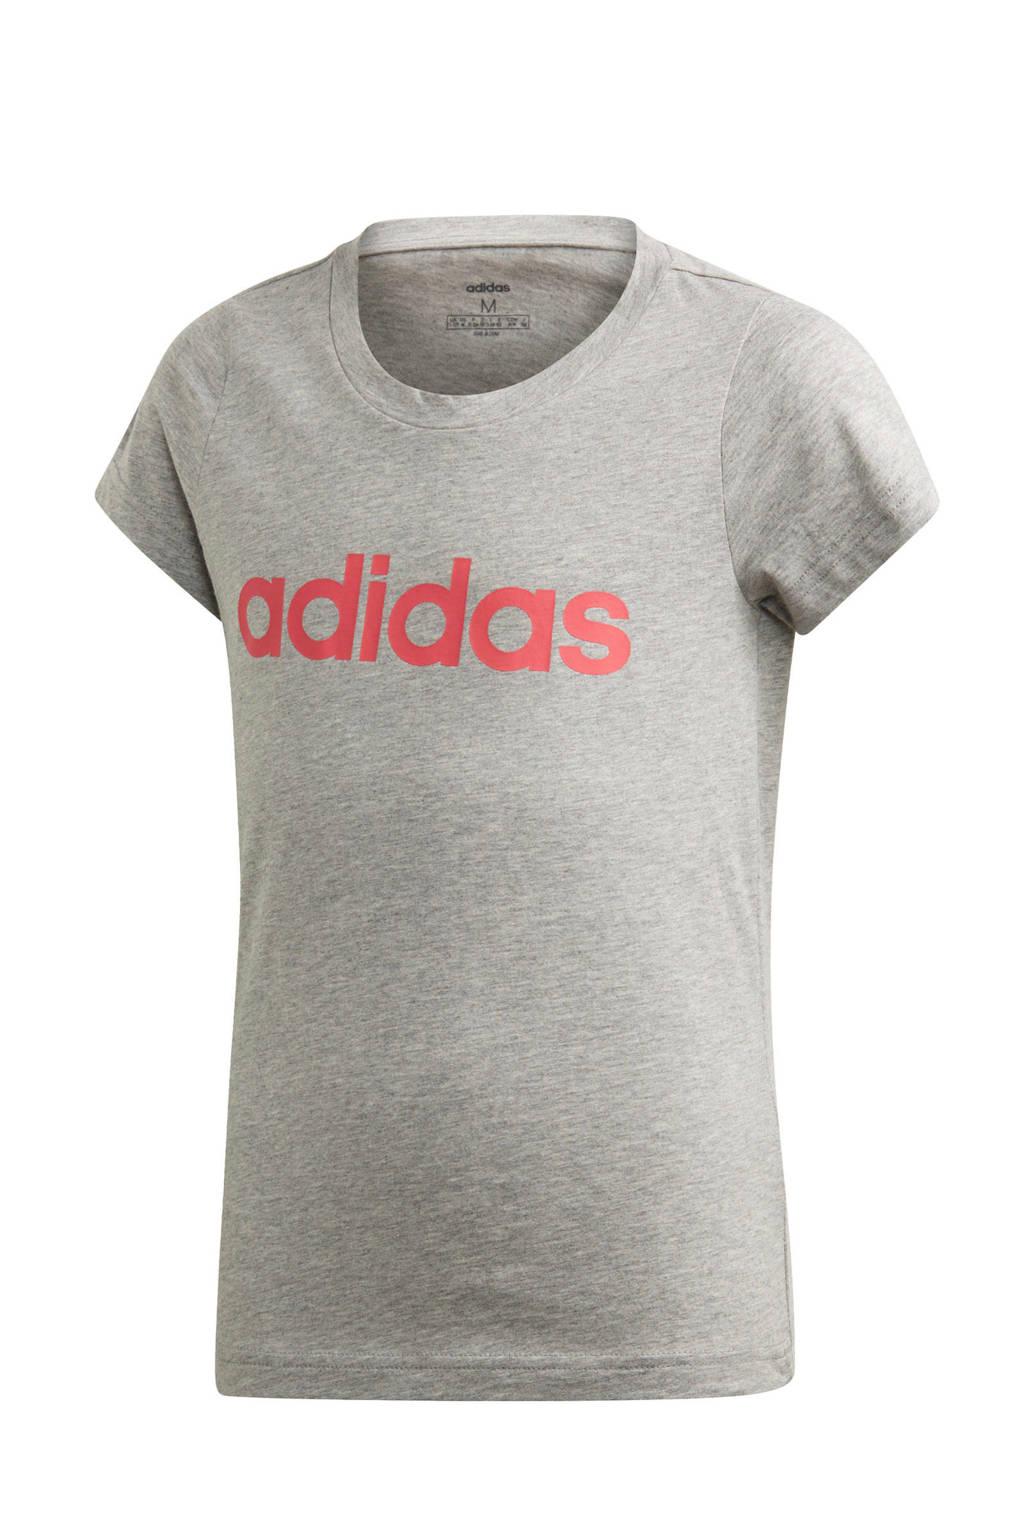 adidas Performance sport T-shirt grijs, Grijs/roze